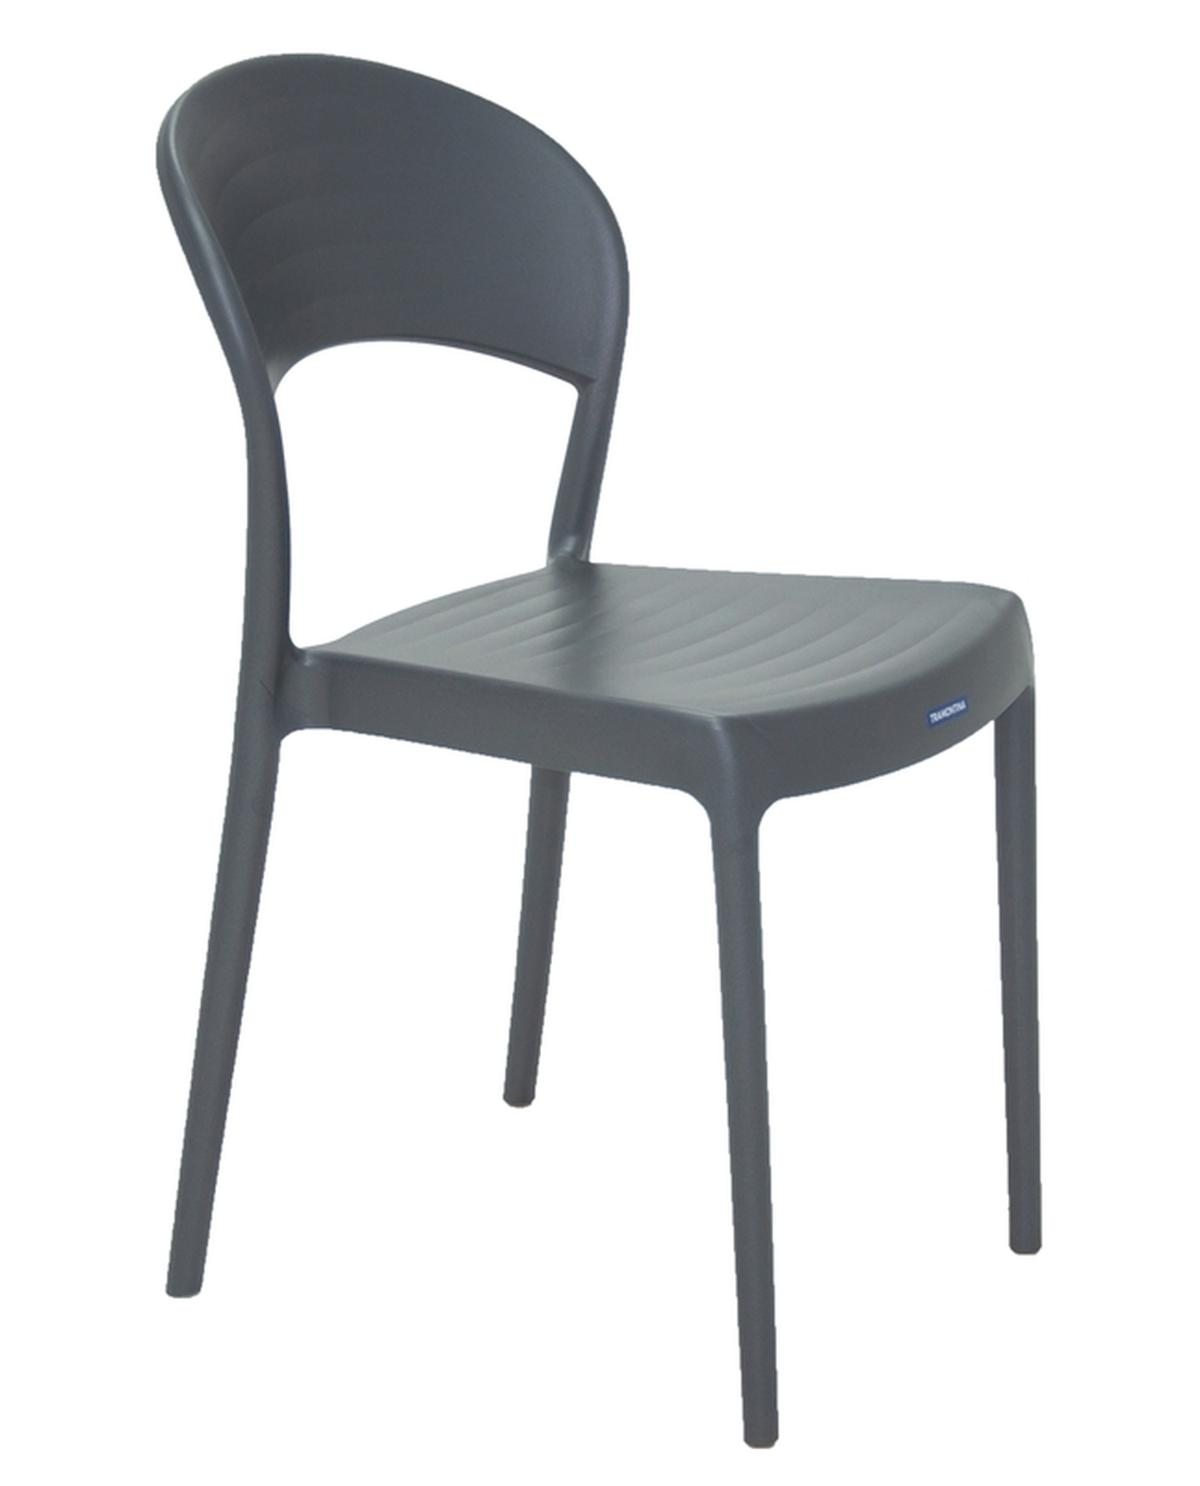 Cadeira Sissi Encosto Fechado Grafite